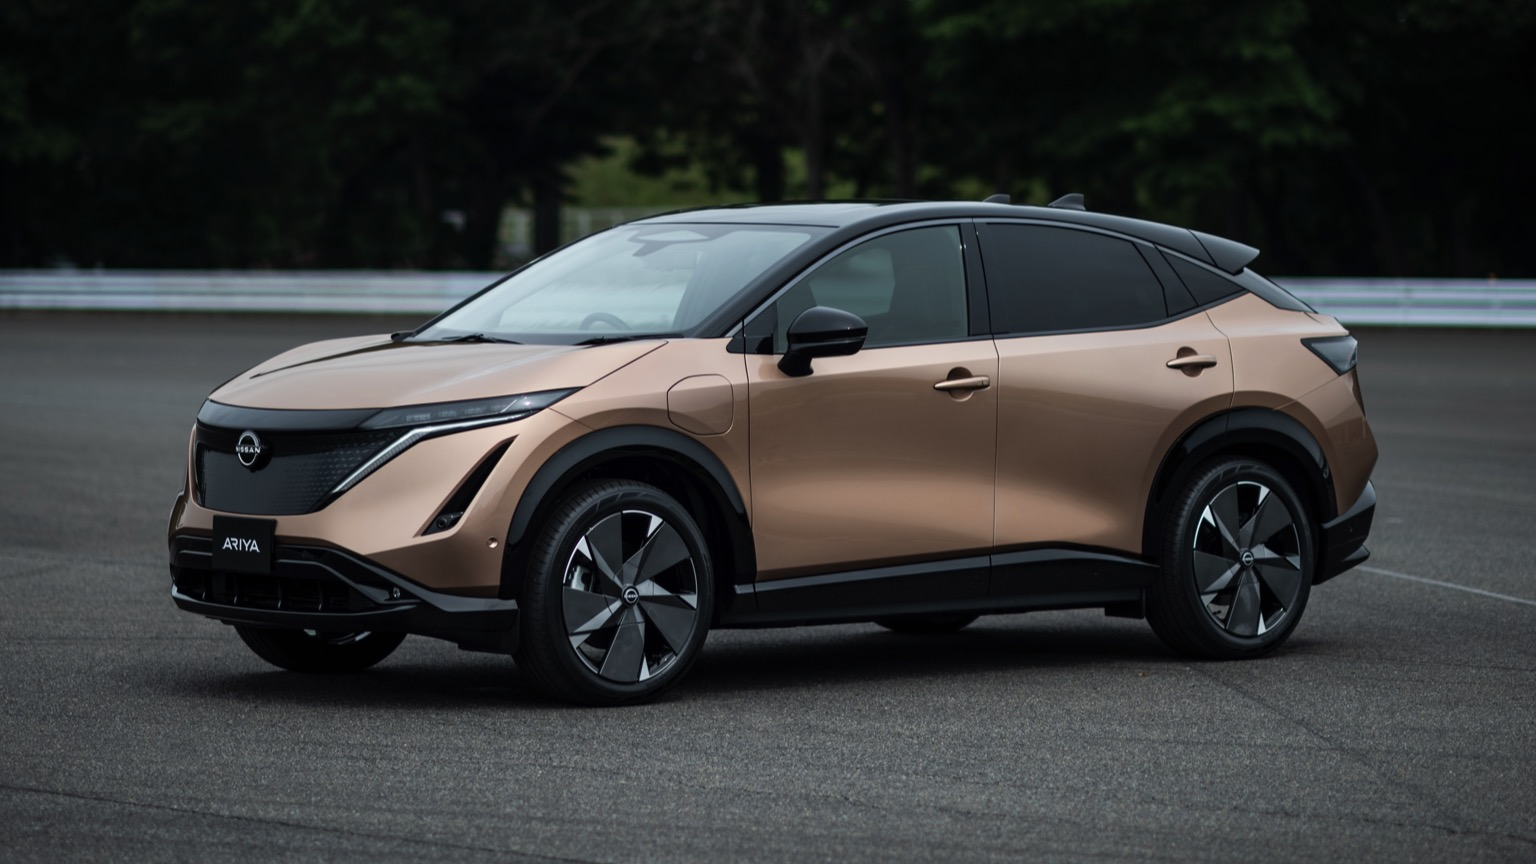 Nissan Ariya 63kWh (2021)